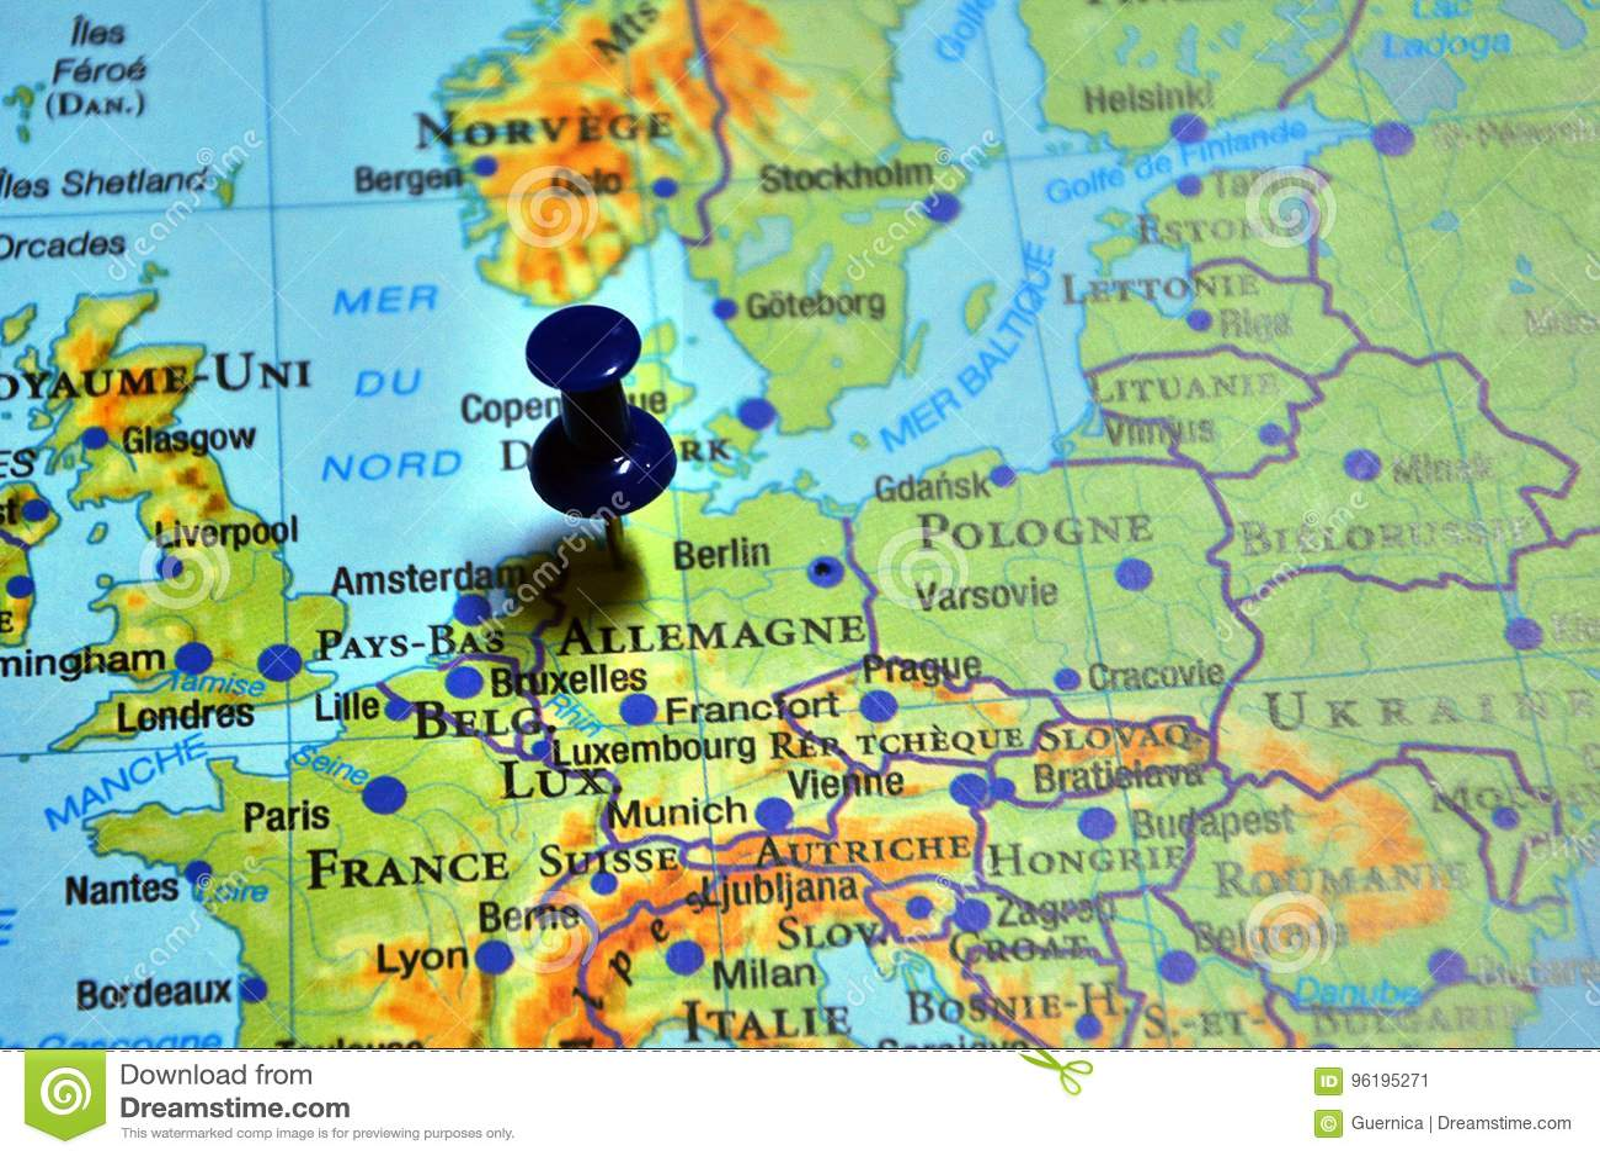 Berlin Polonge Pin Travel Destination Stock Image Image Of Pologne